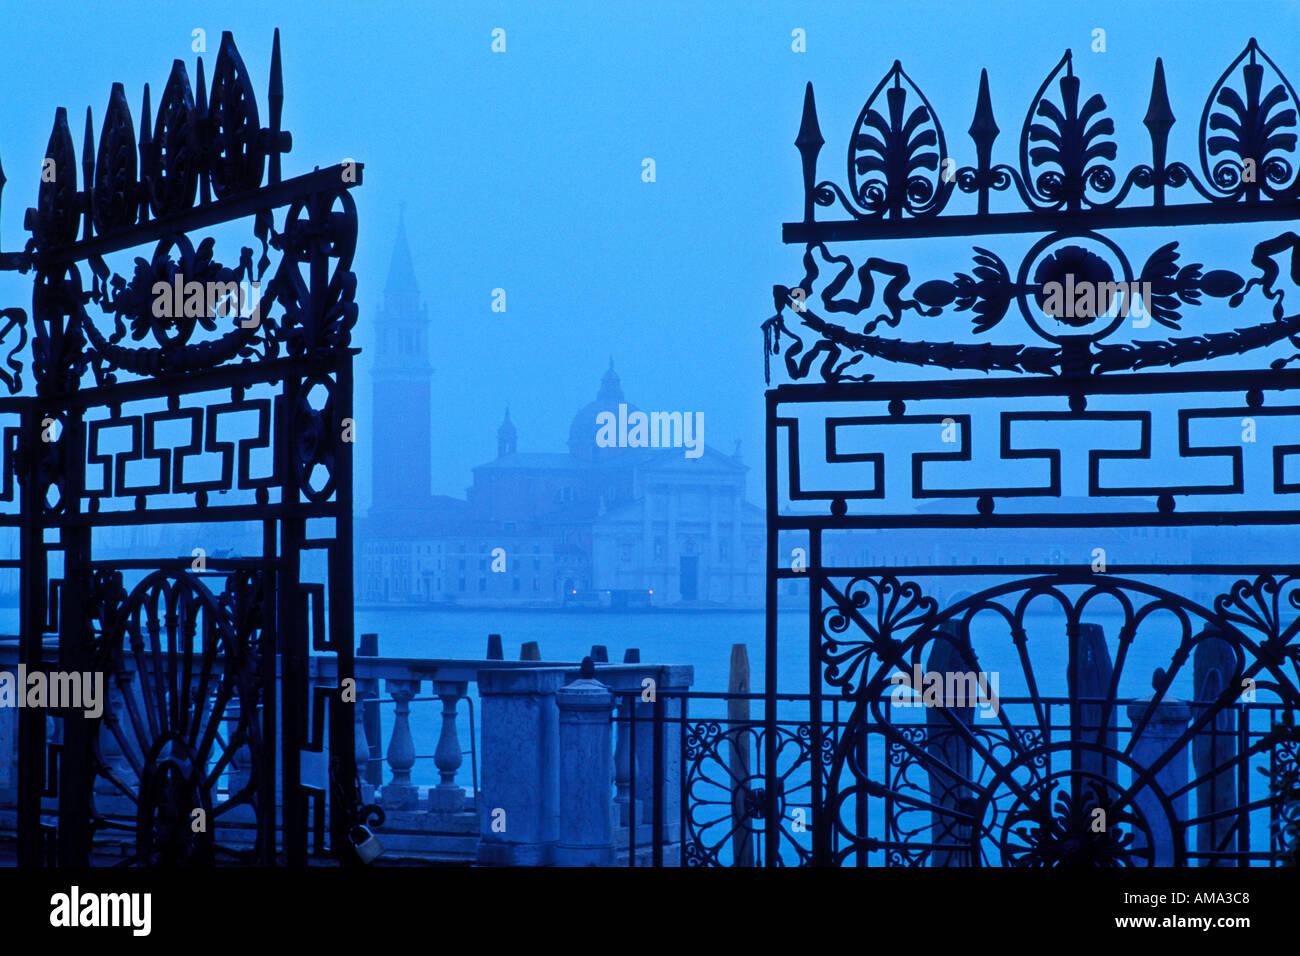 Italy Venice View of San Giorgio Maggiore from The Giardinetti Reali Royal gardens framed through an iron gate - Stock Image